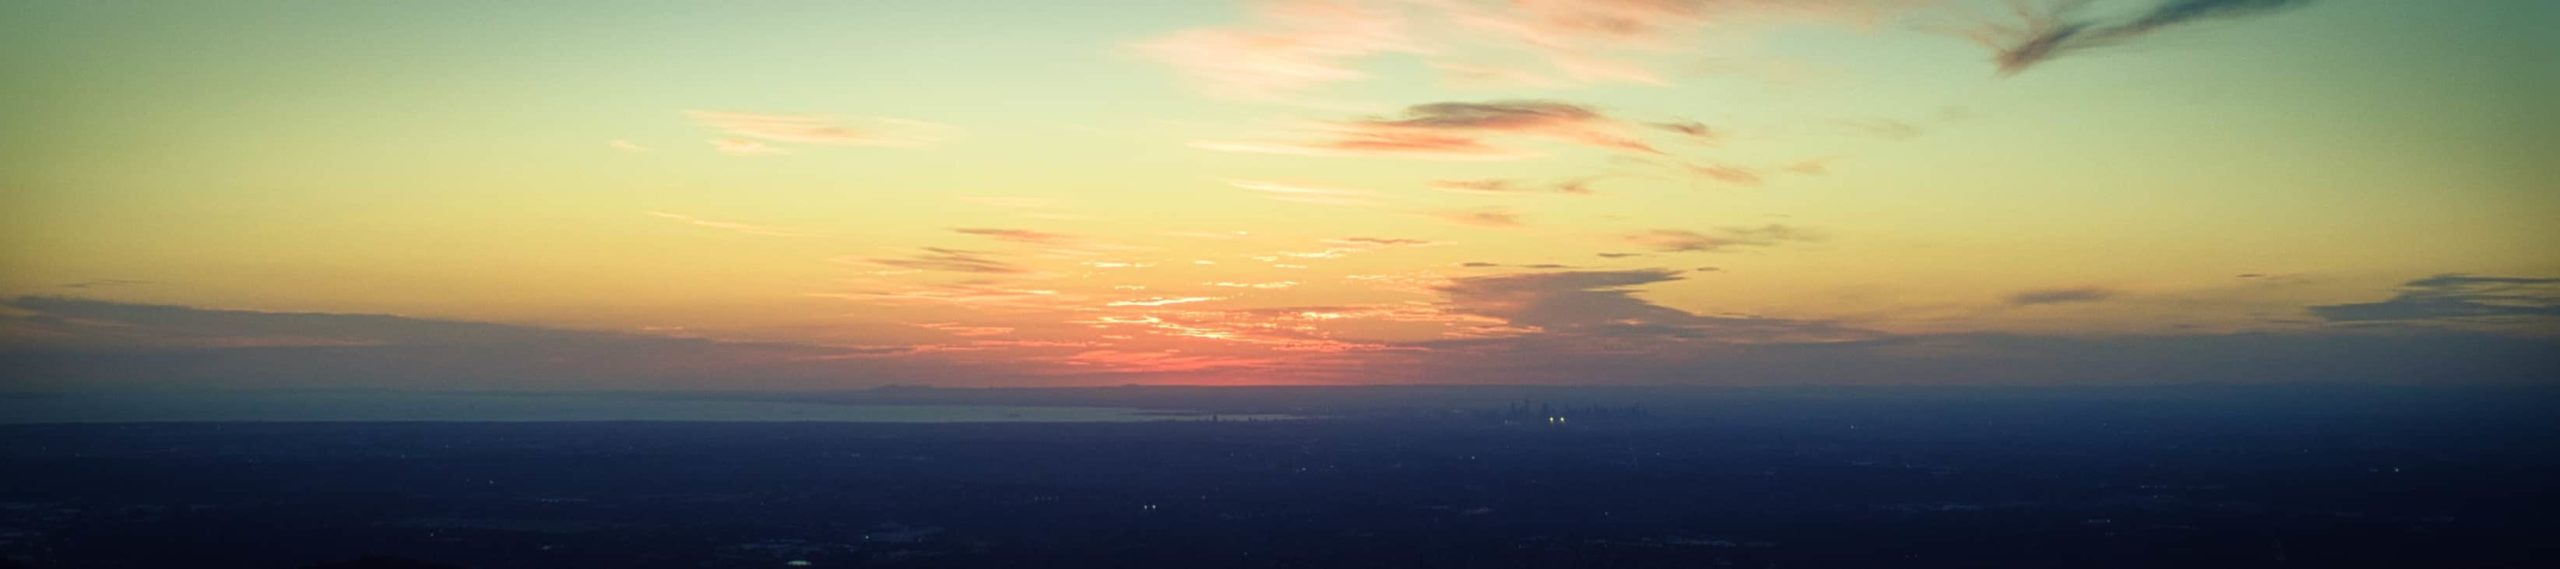 panorama olinda mit skyline melbourne sunset